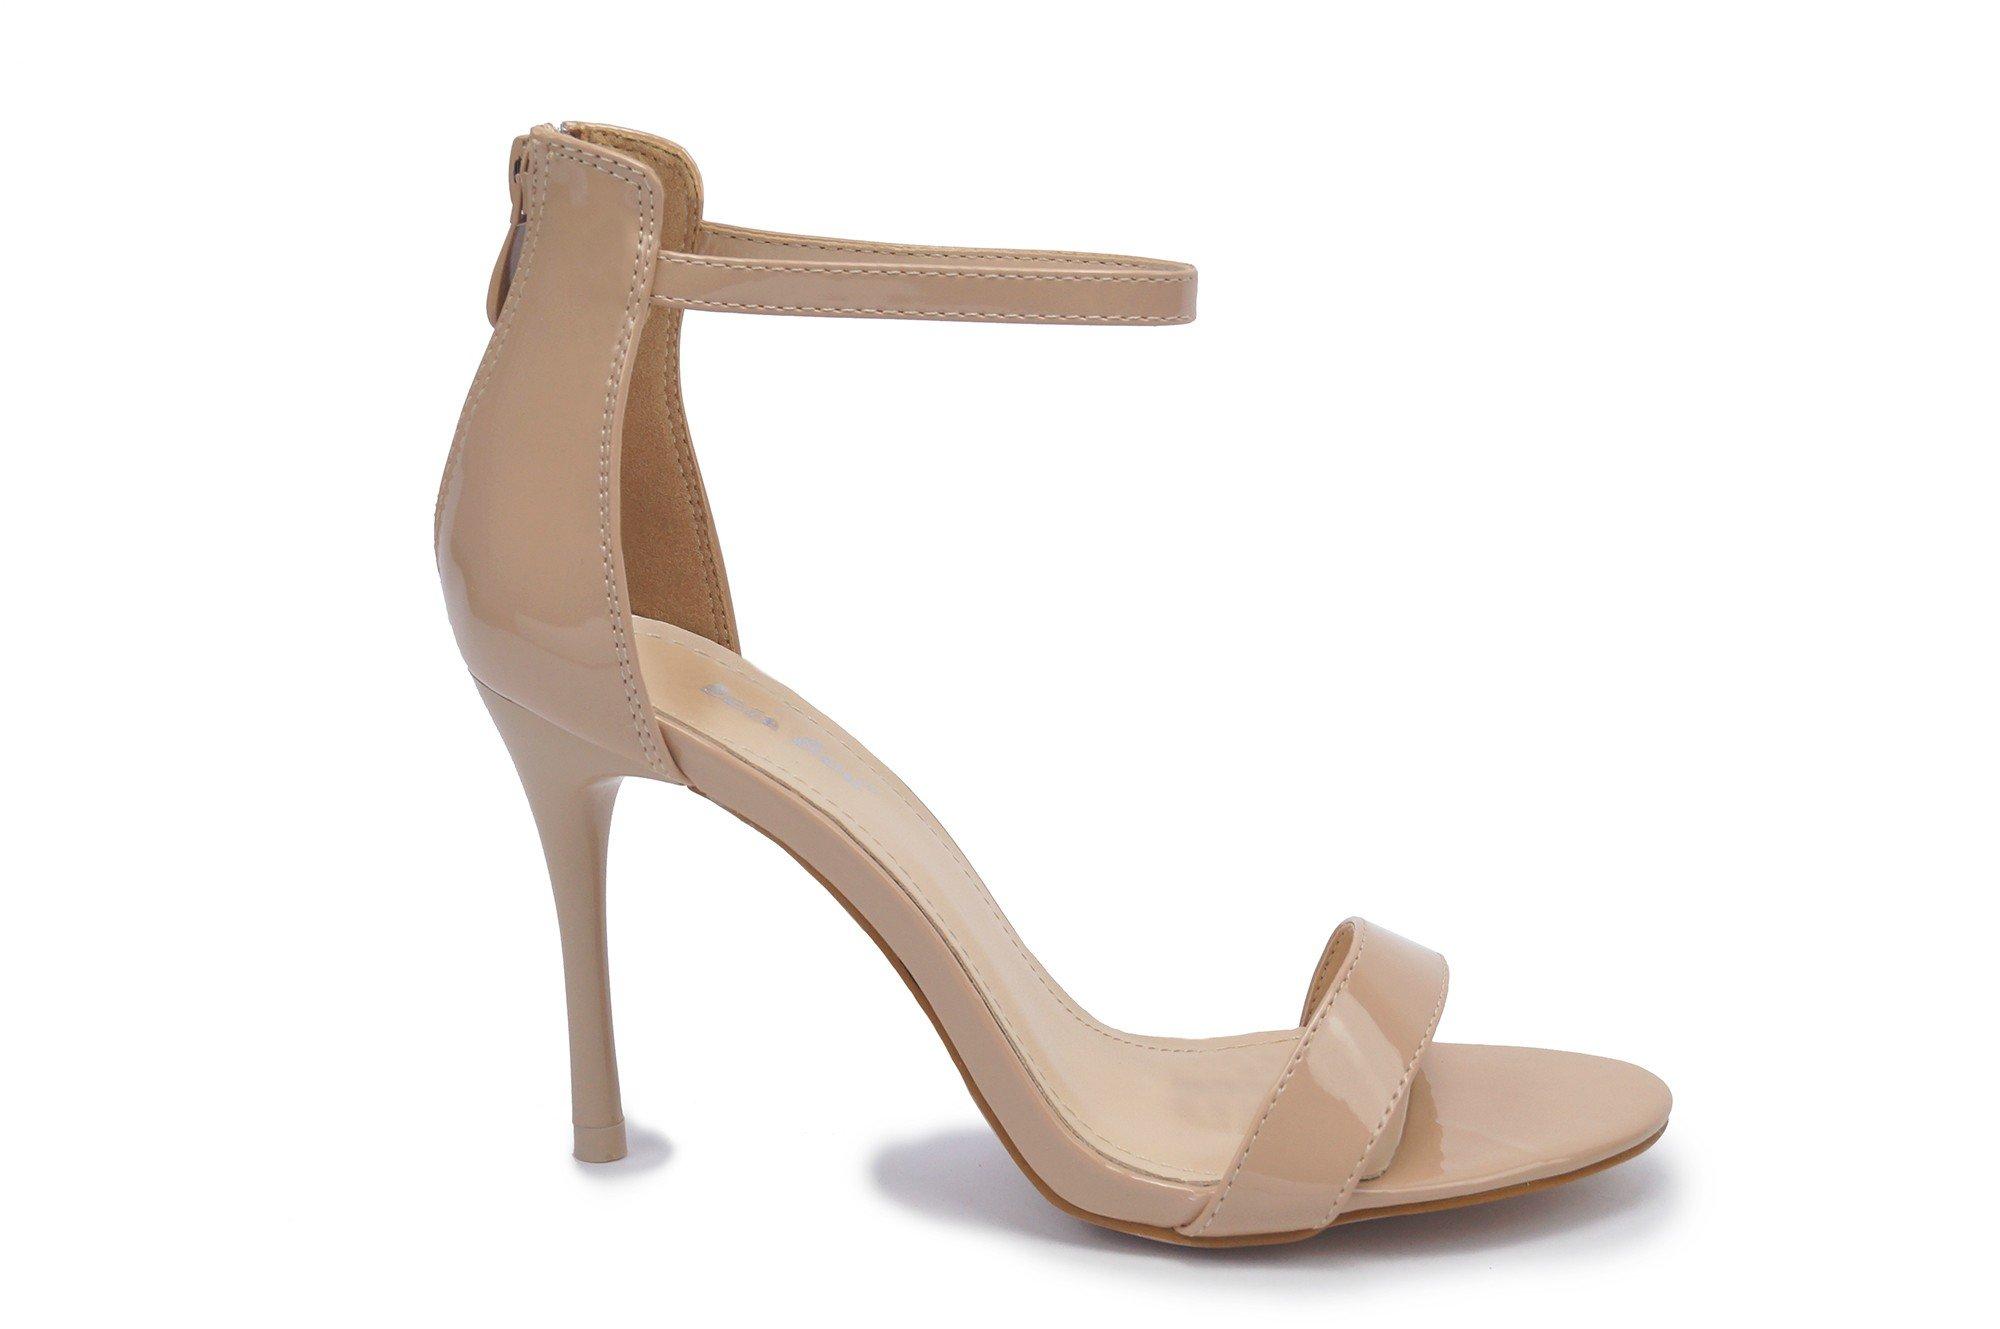 d330331e95145 Béžové sandále Irina - Divalli.sk